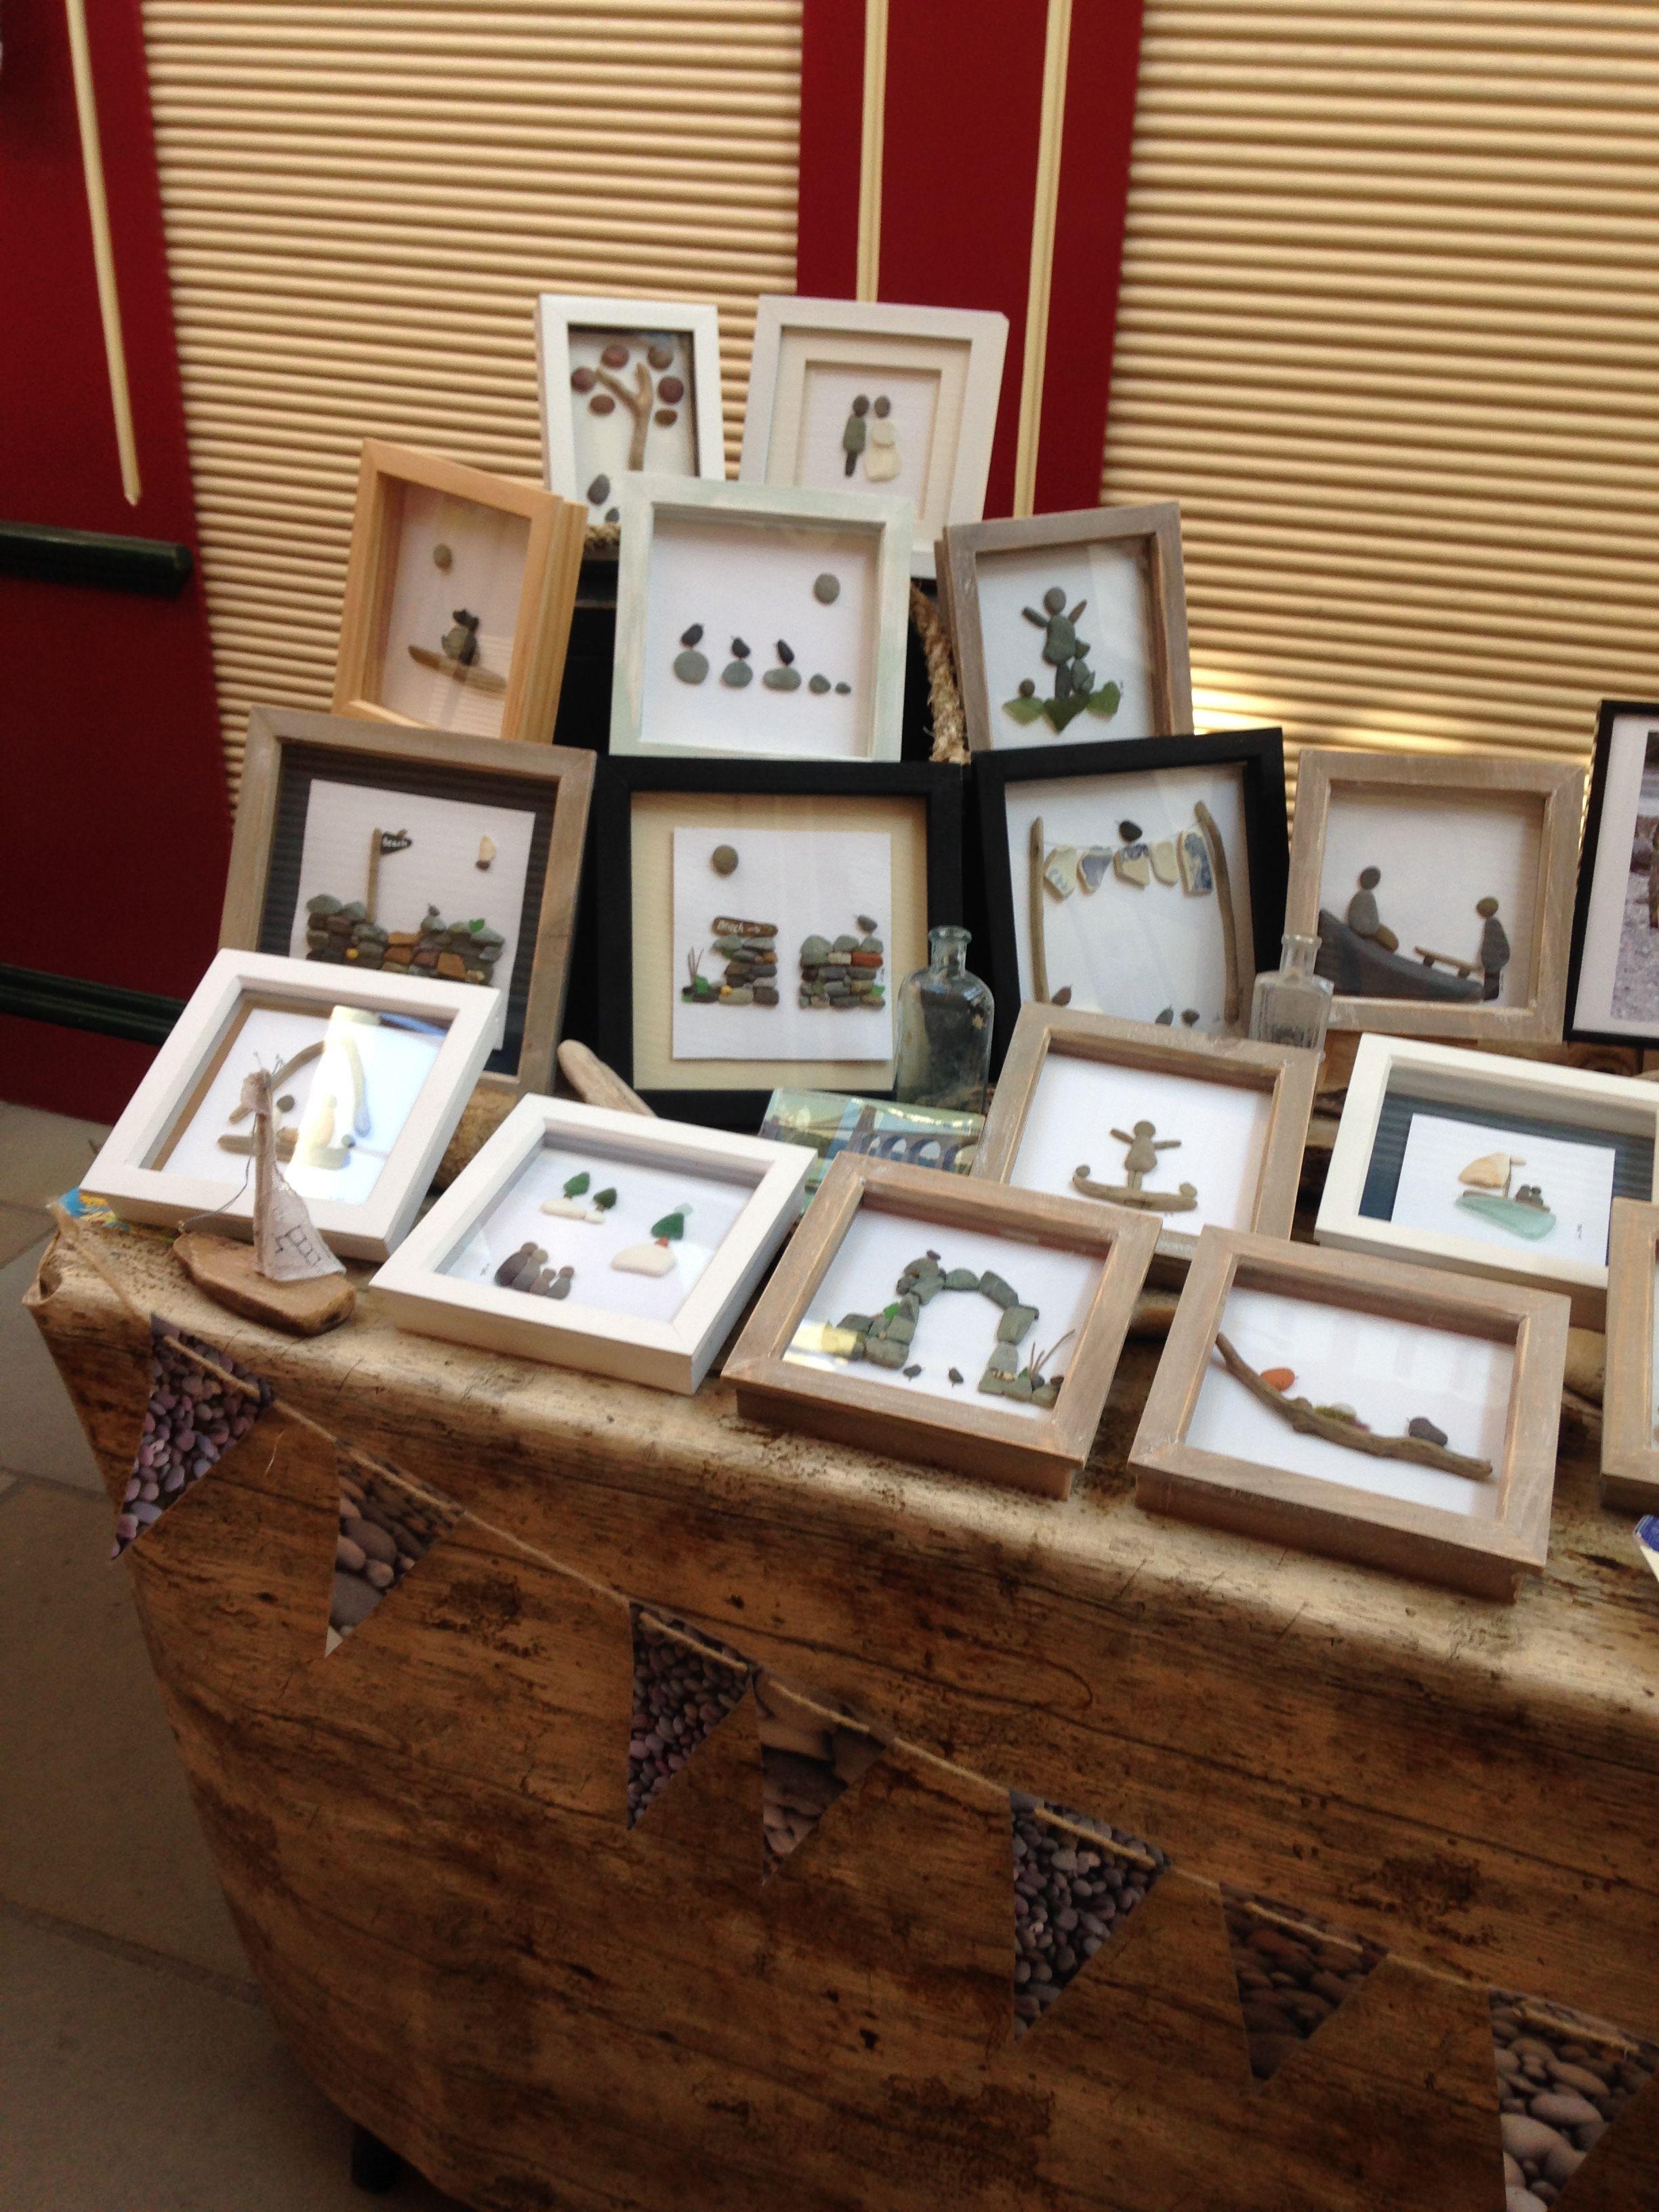 My stall at Stockport Artisan Market